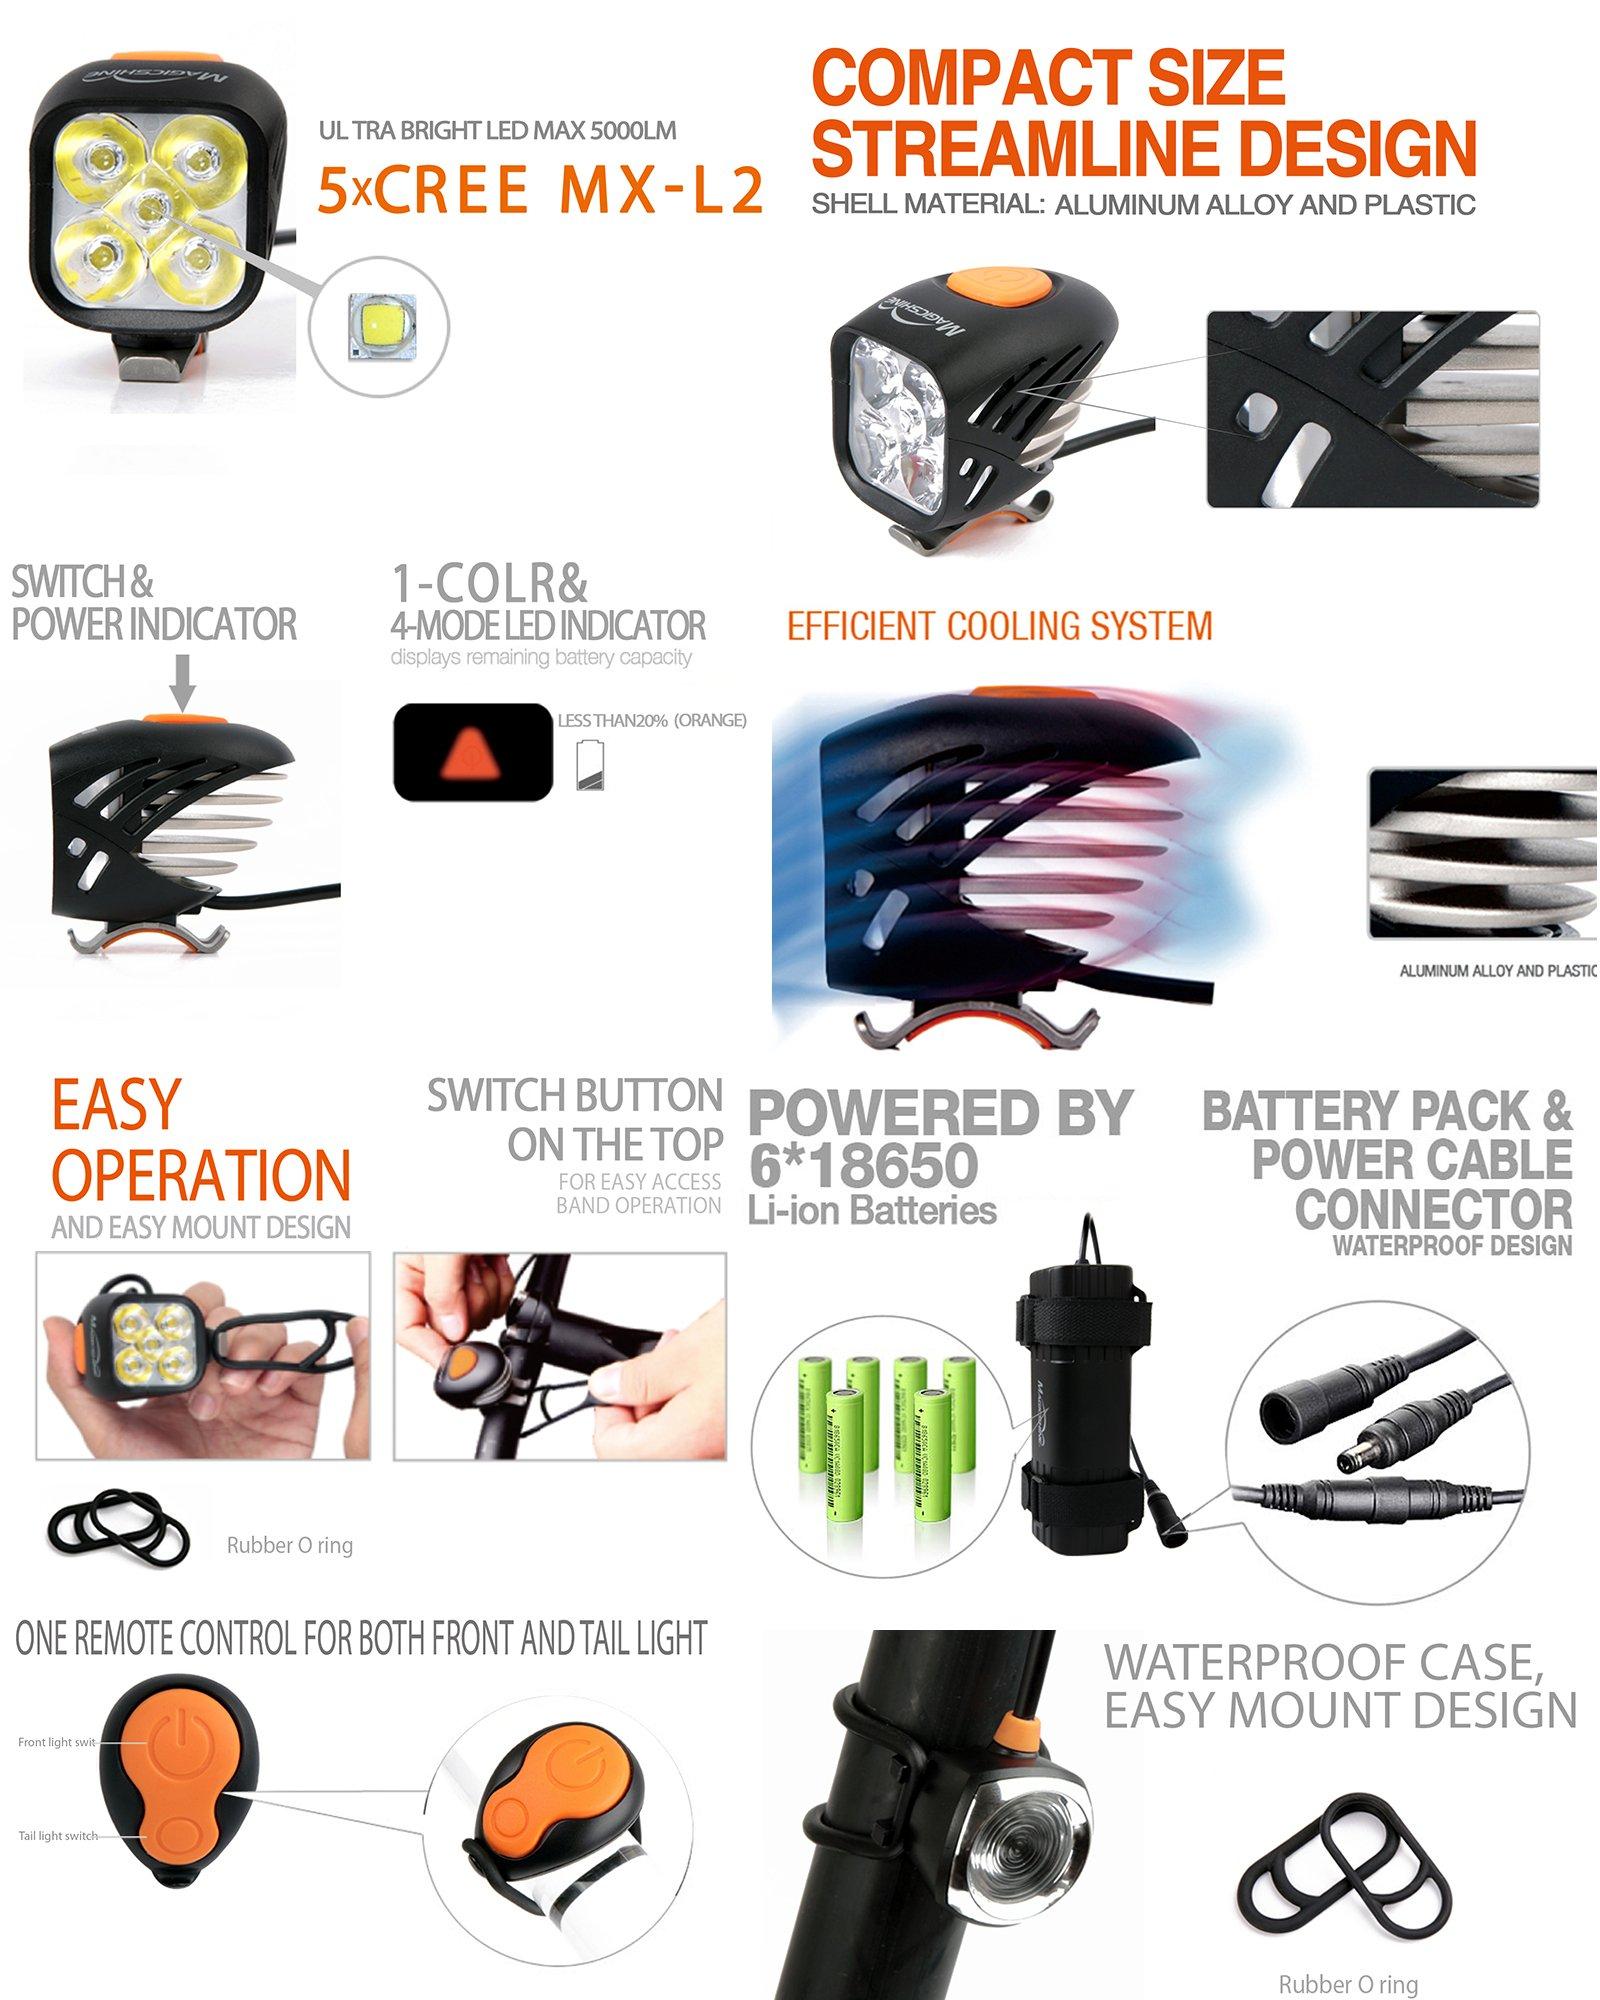 Magicshine MJ 906, High Grade MTB Enduro Bike Light Set, 5000 Lumens of Max output. Wireless Remote Bicycle Lights Front And Rear Combo, LED Bike Tail Light, Perfect Beam Pattern Bright Bike Light by Magicshine (Image #3)